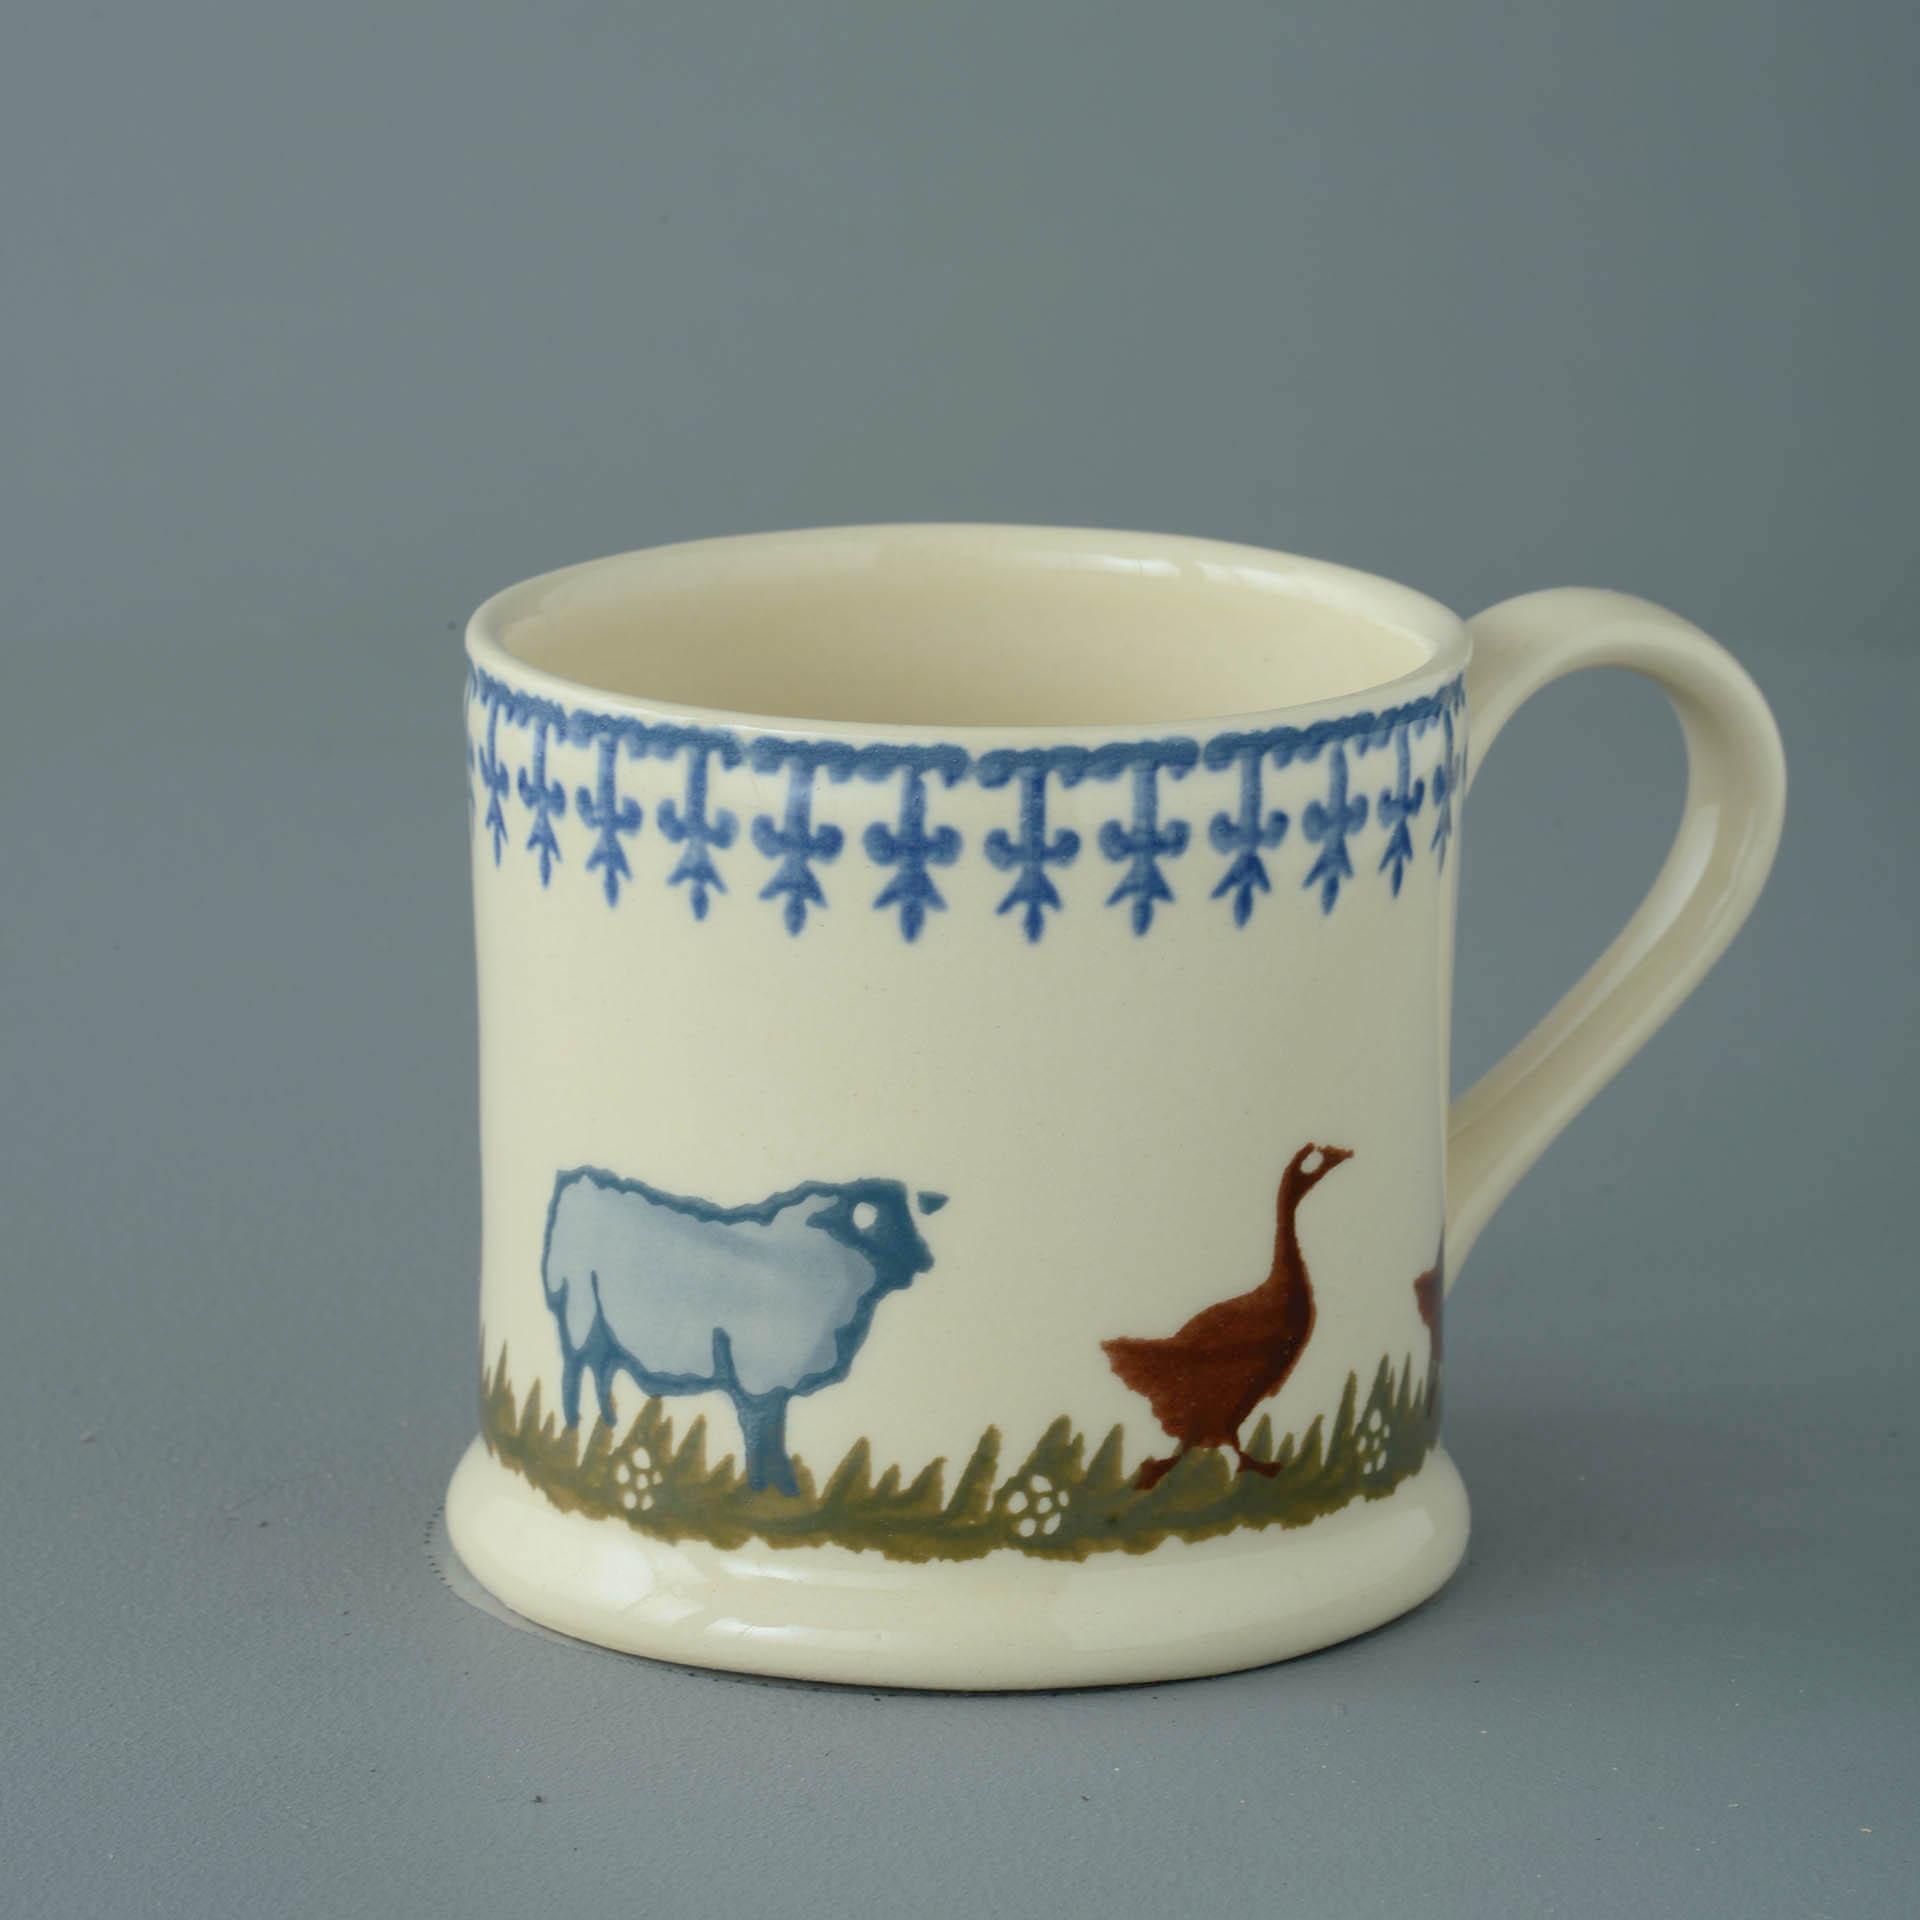 Farm Animals 250ml Large Mug 8 x 8.4cm